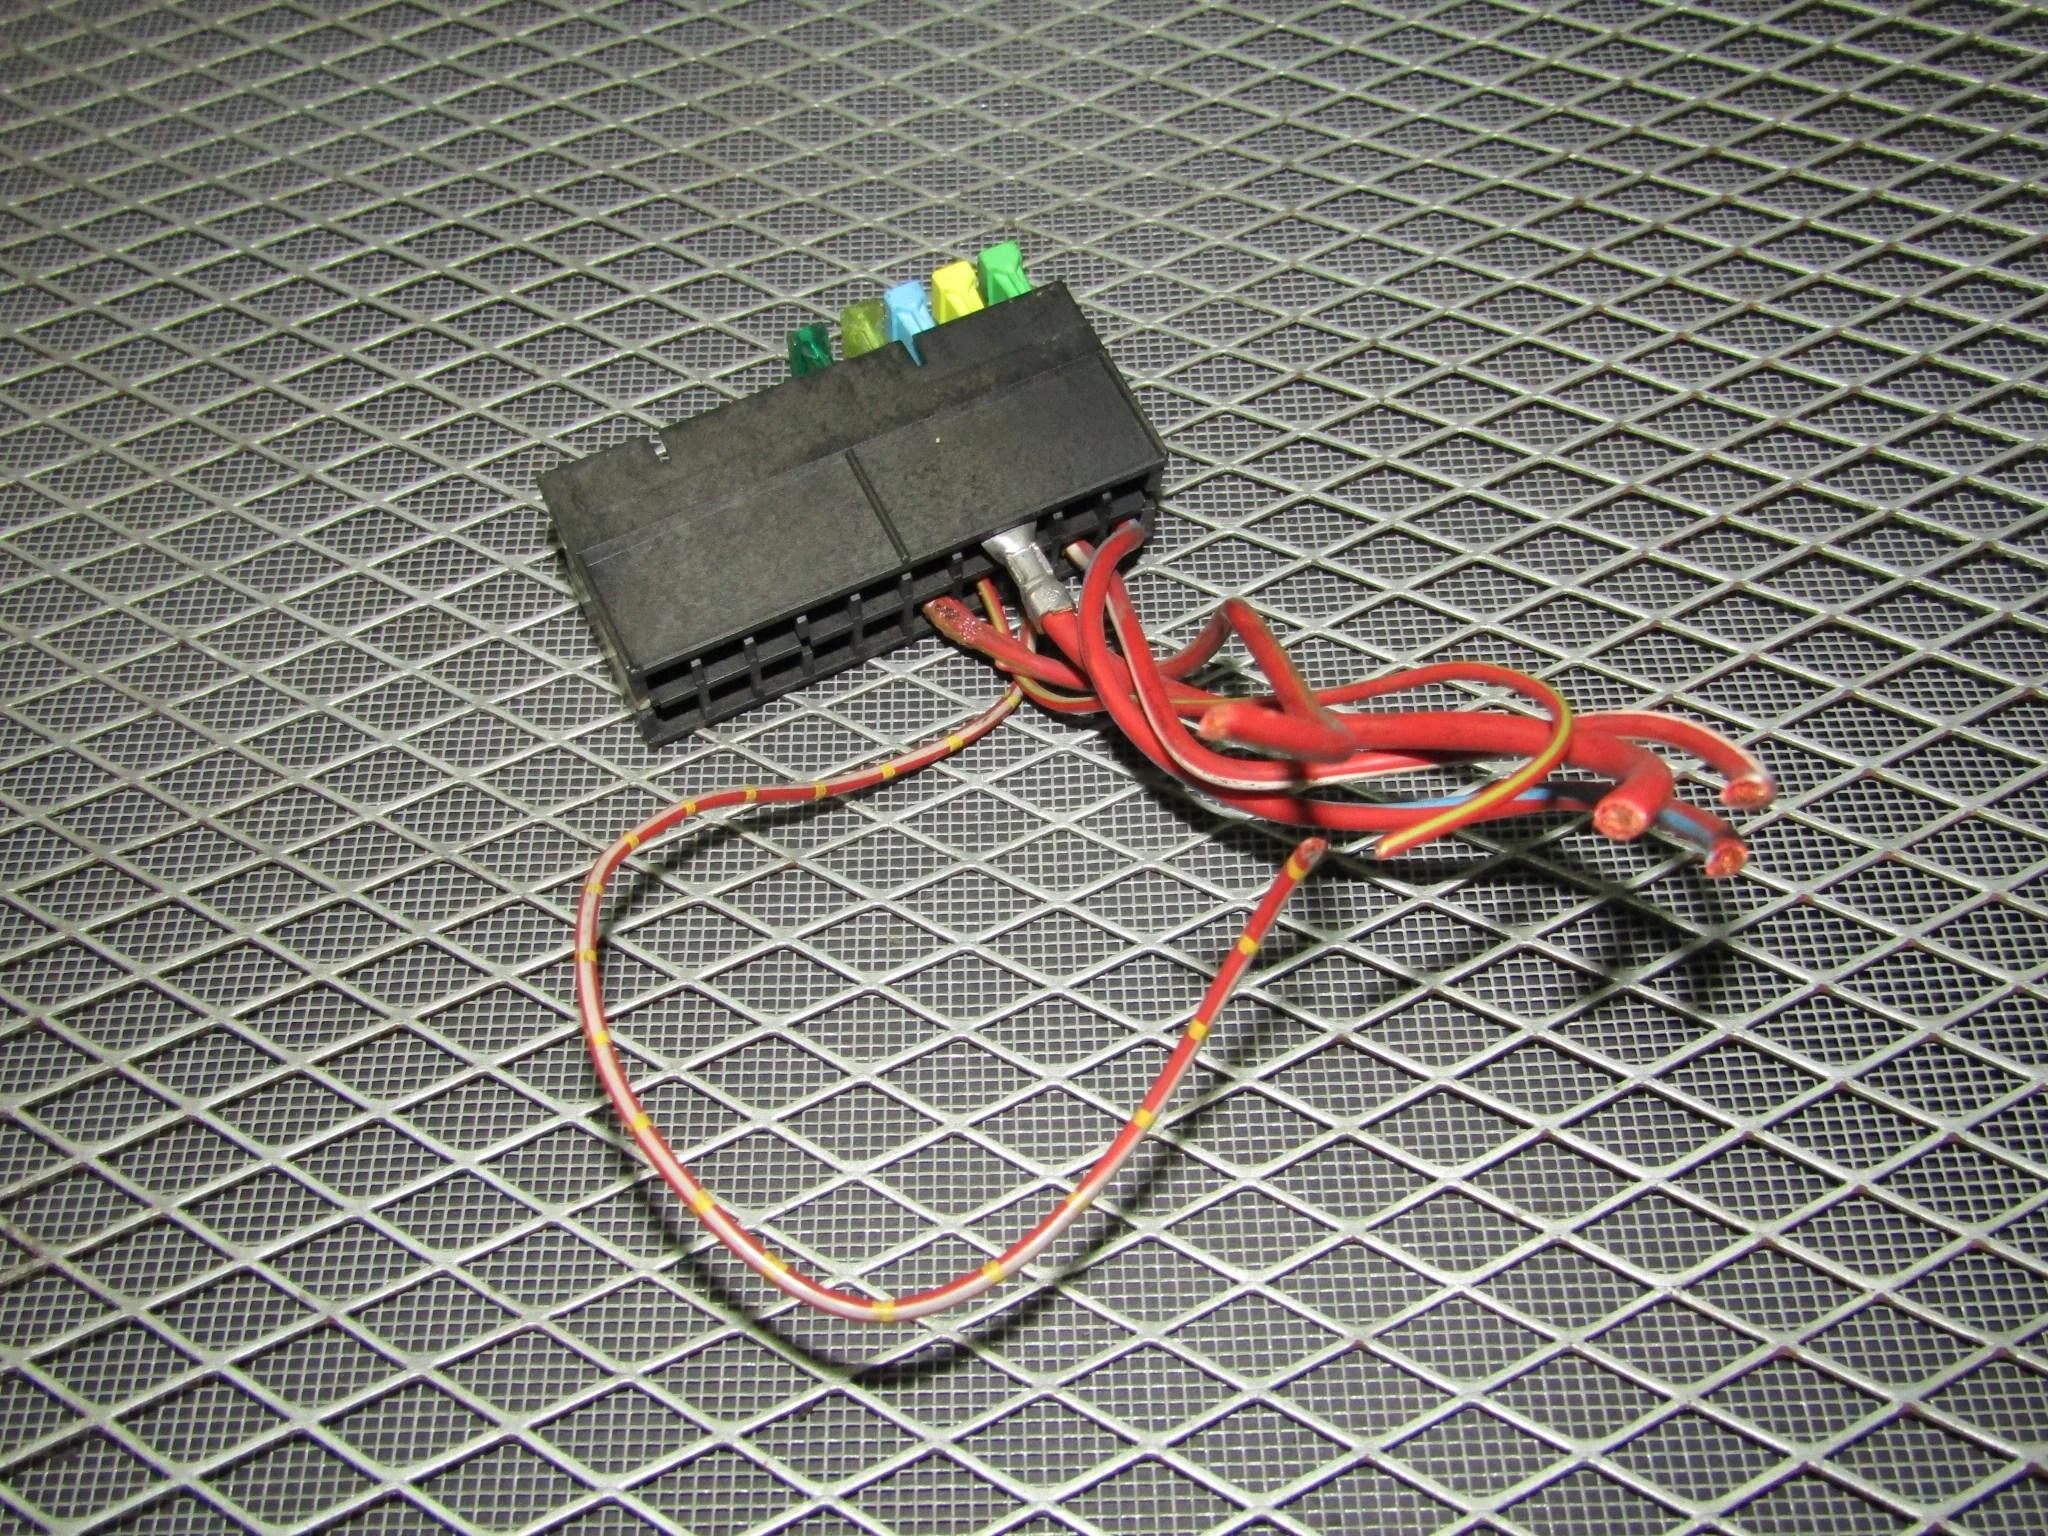 92 93 94 95 bmw 325 oem engine fuse box autopartone com rh autopartone com 1994 [ 2048 x 1536 Pixel ]